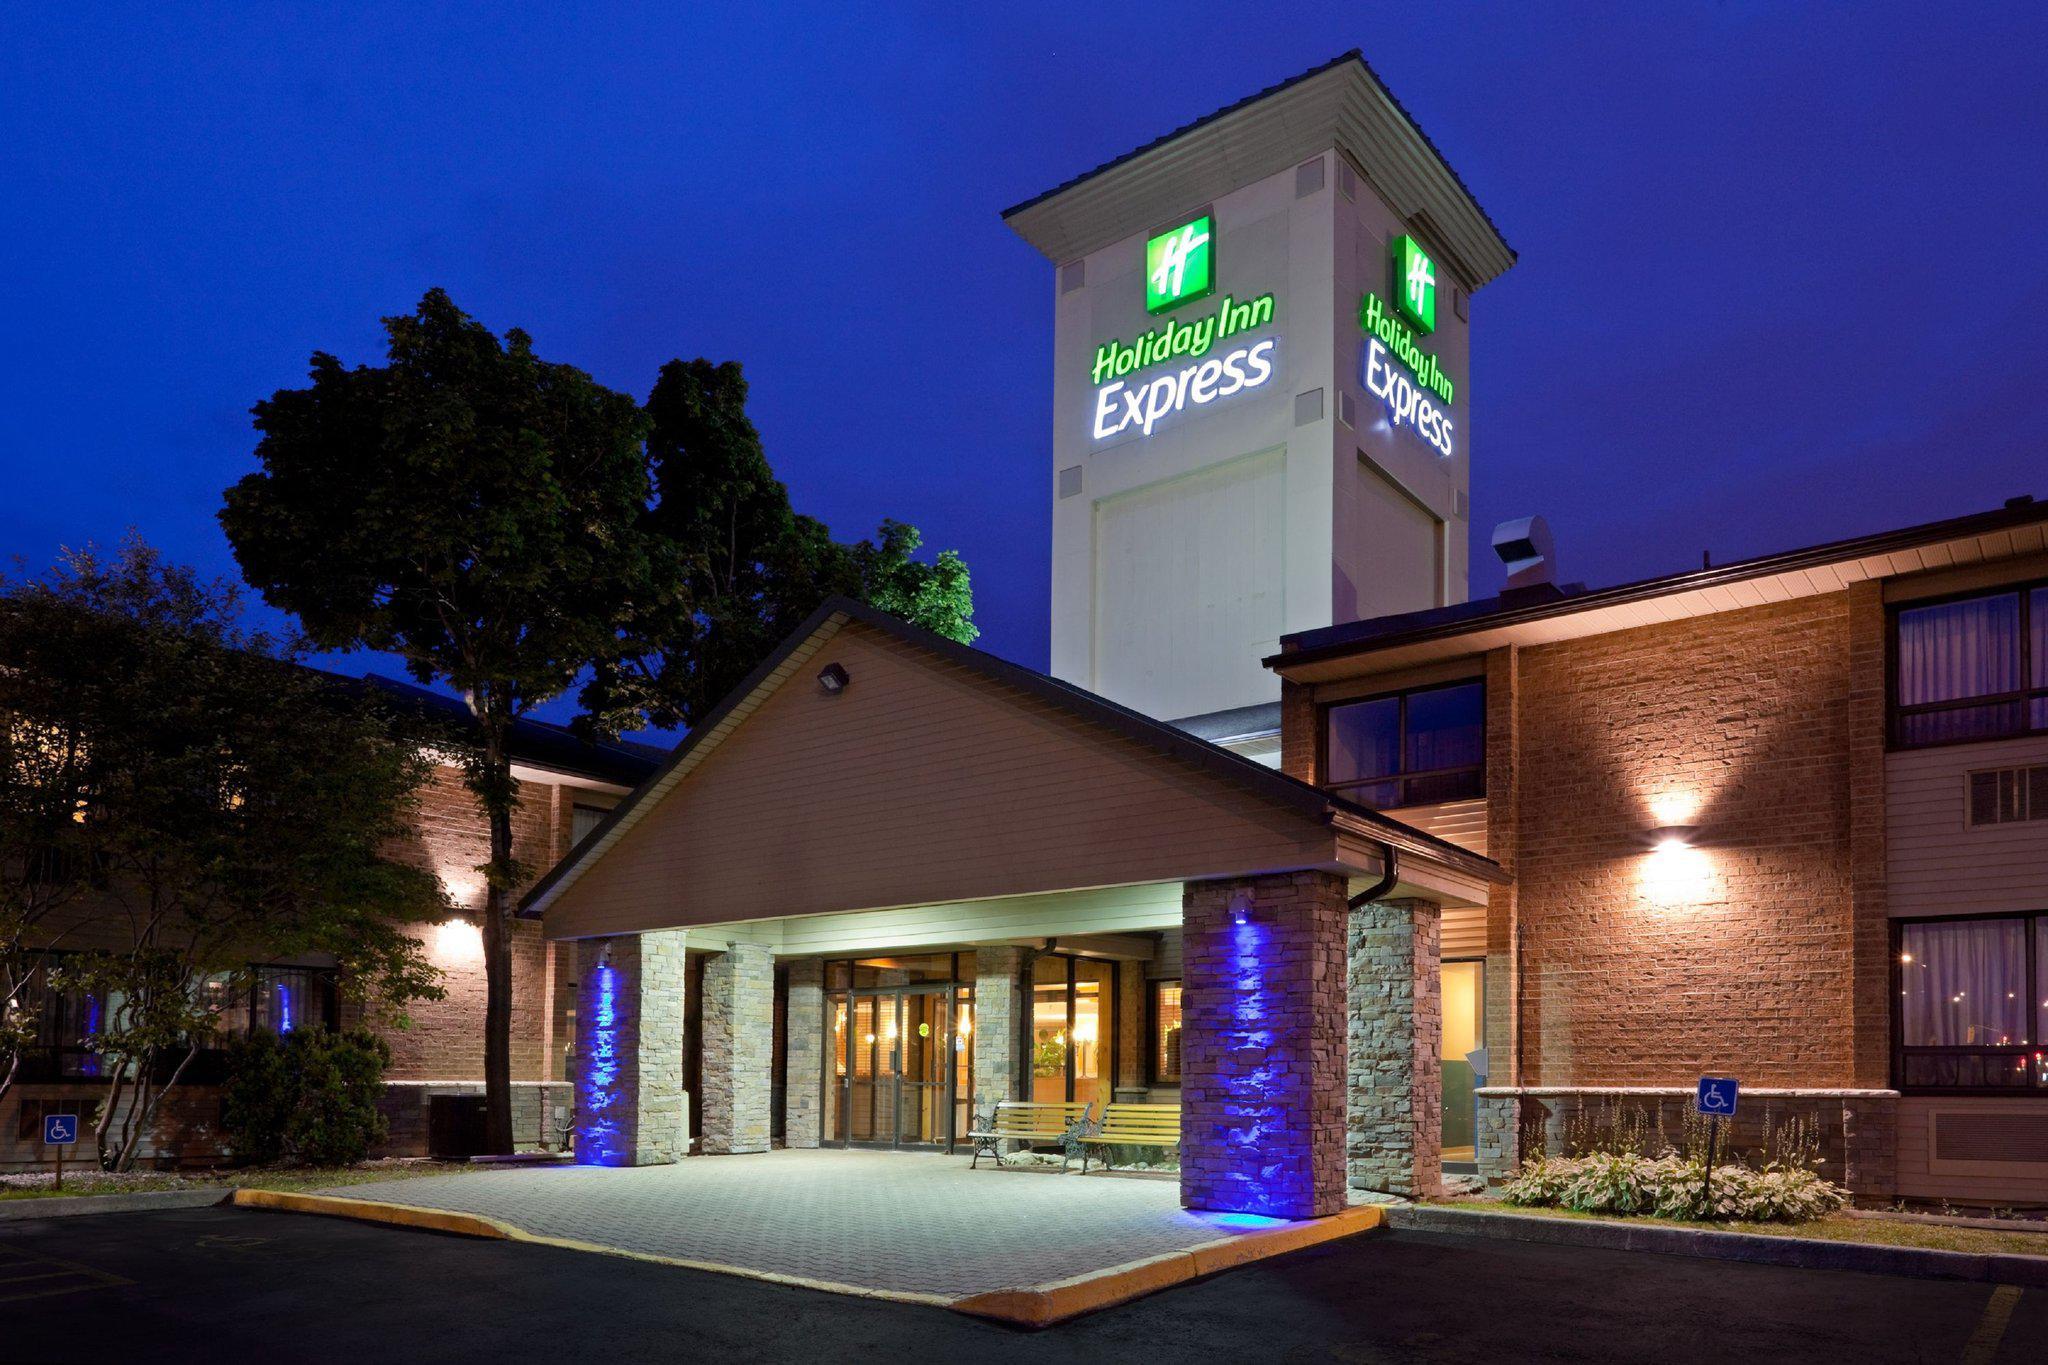 Holiday Inn Express Toronto East - Scarborough